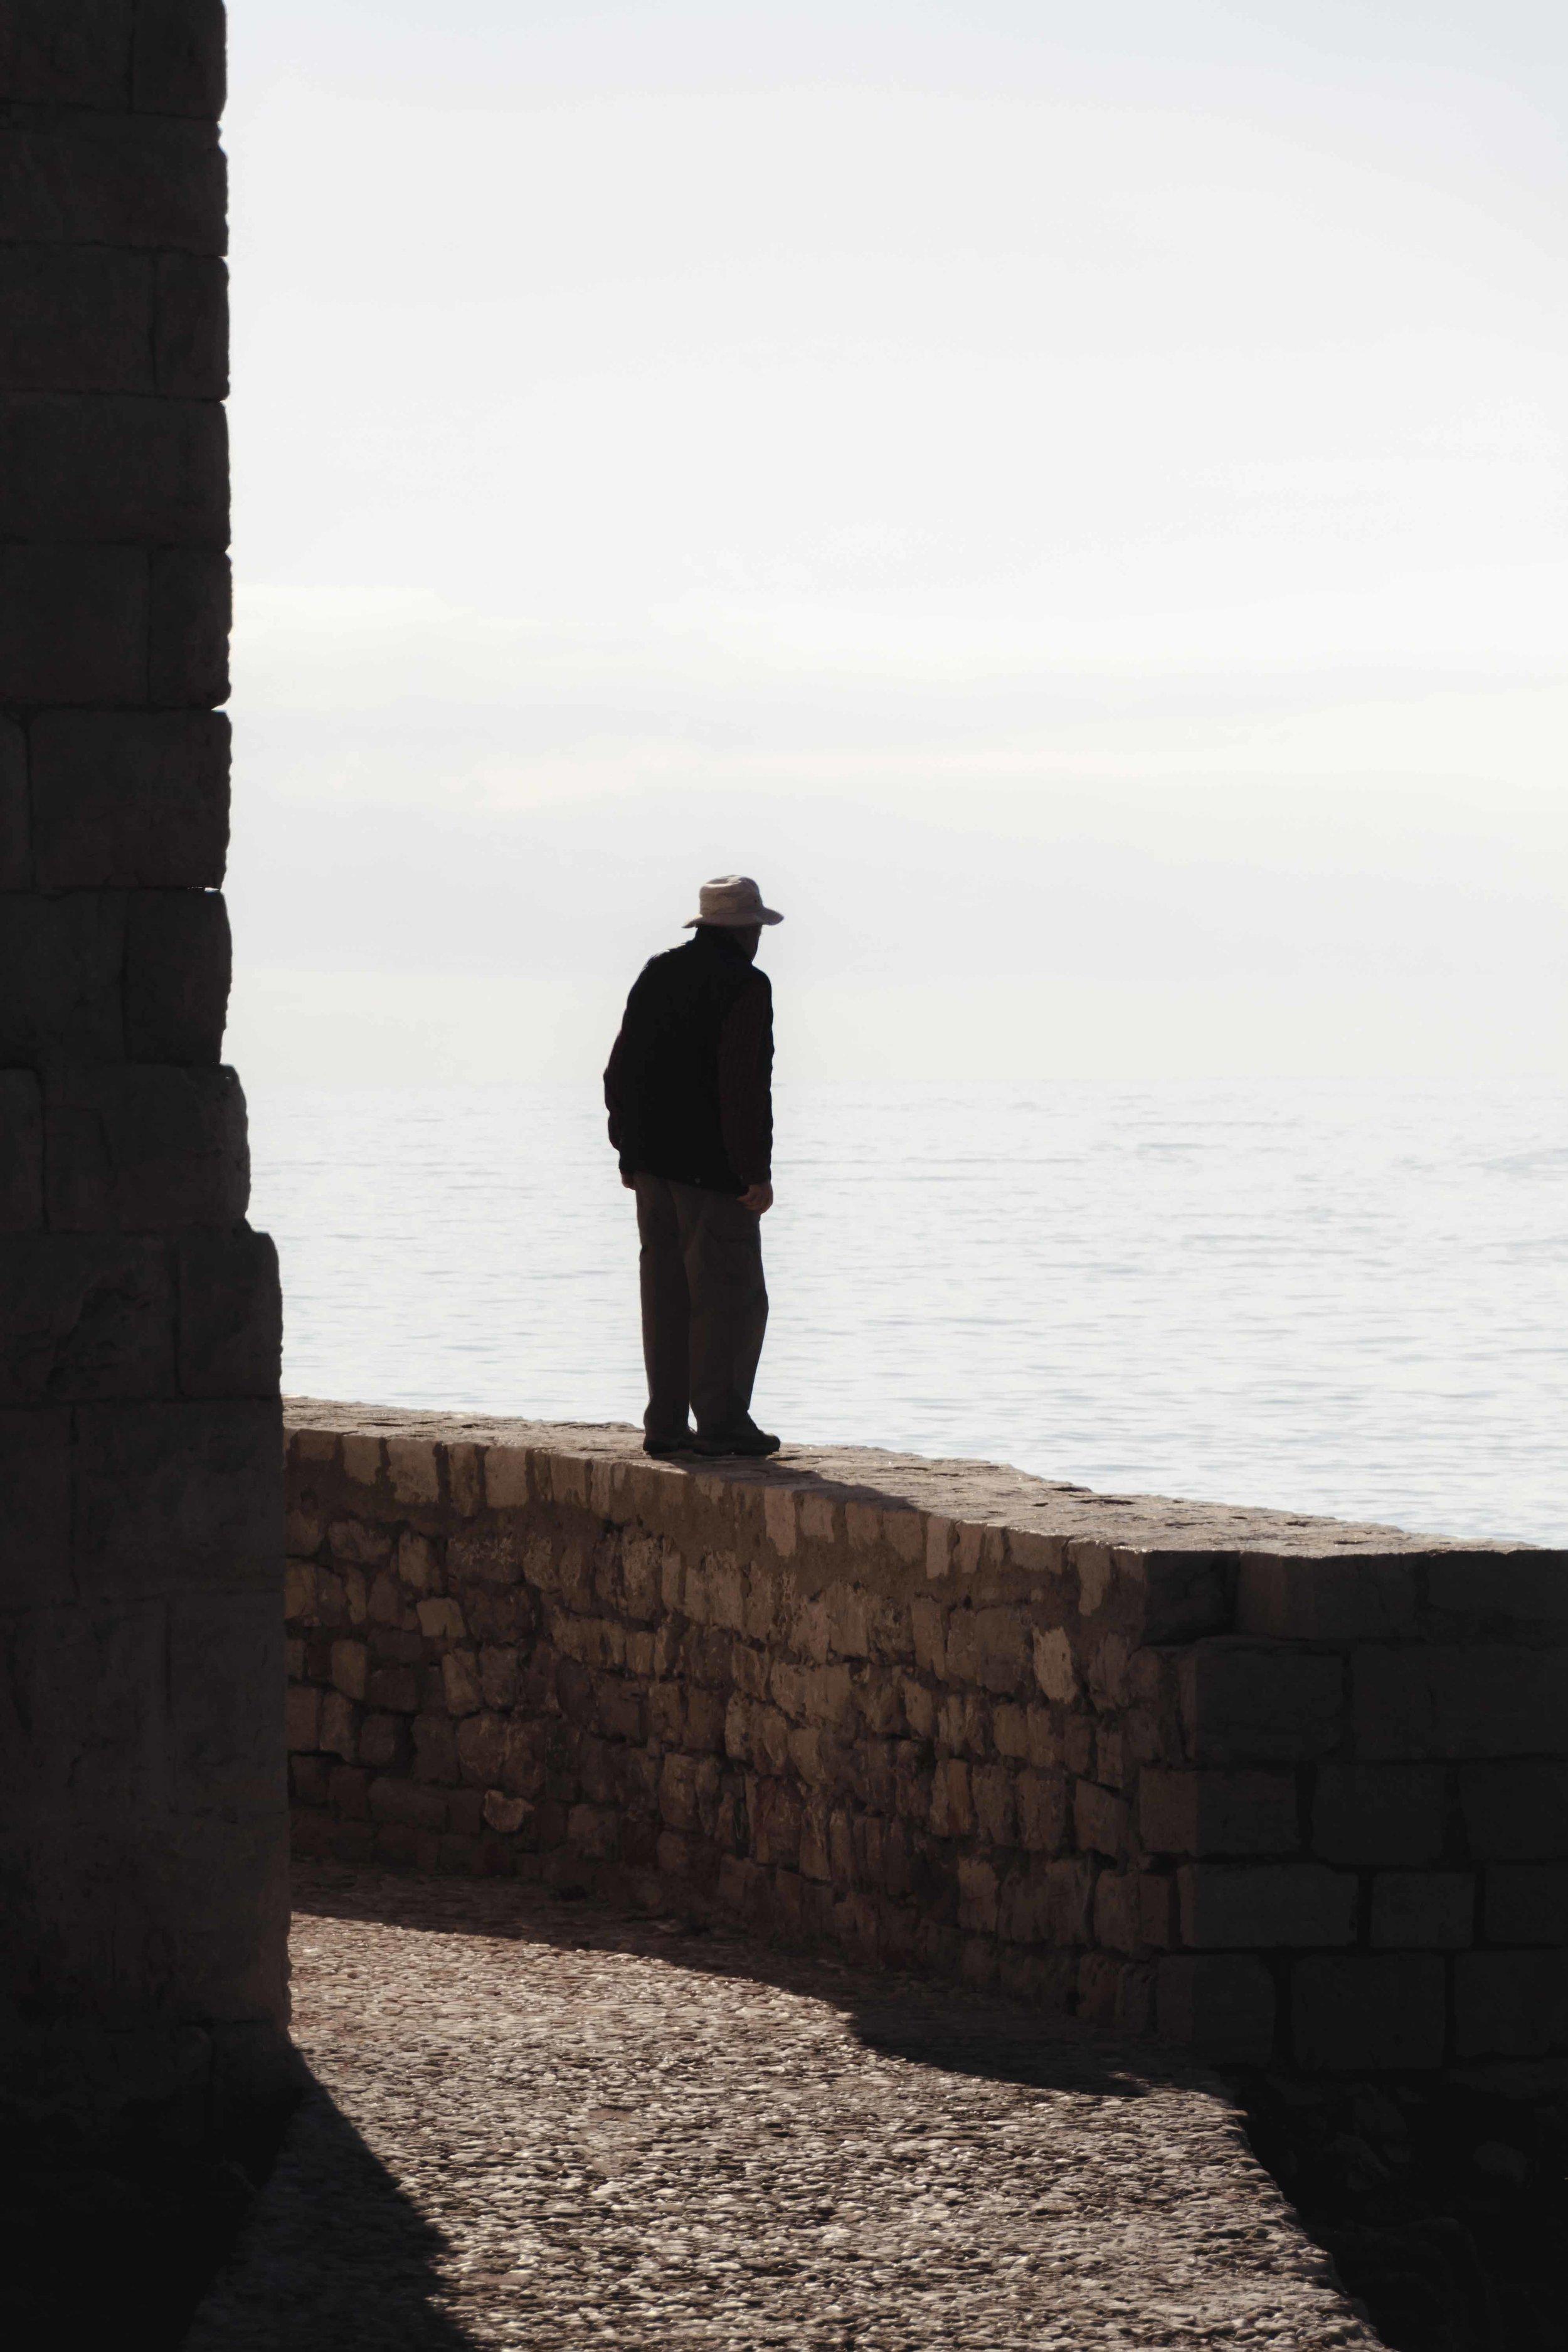 Cote-Azur-2-Ophelie-Delmarle-Photographe.jpg